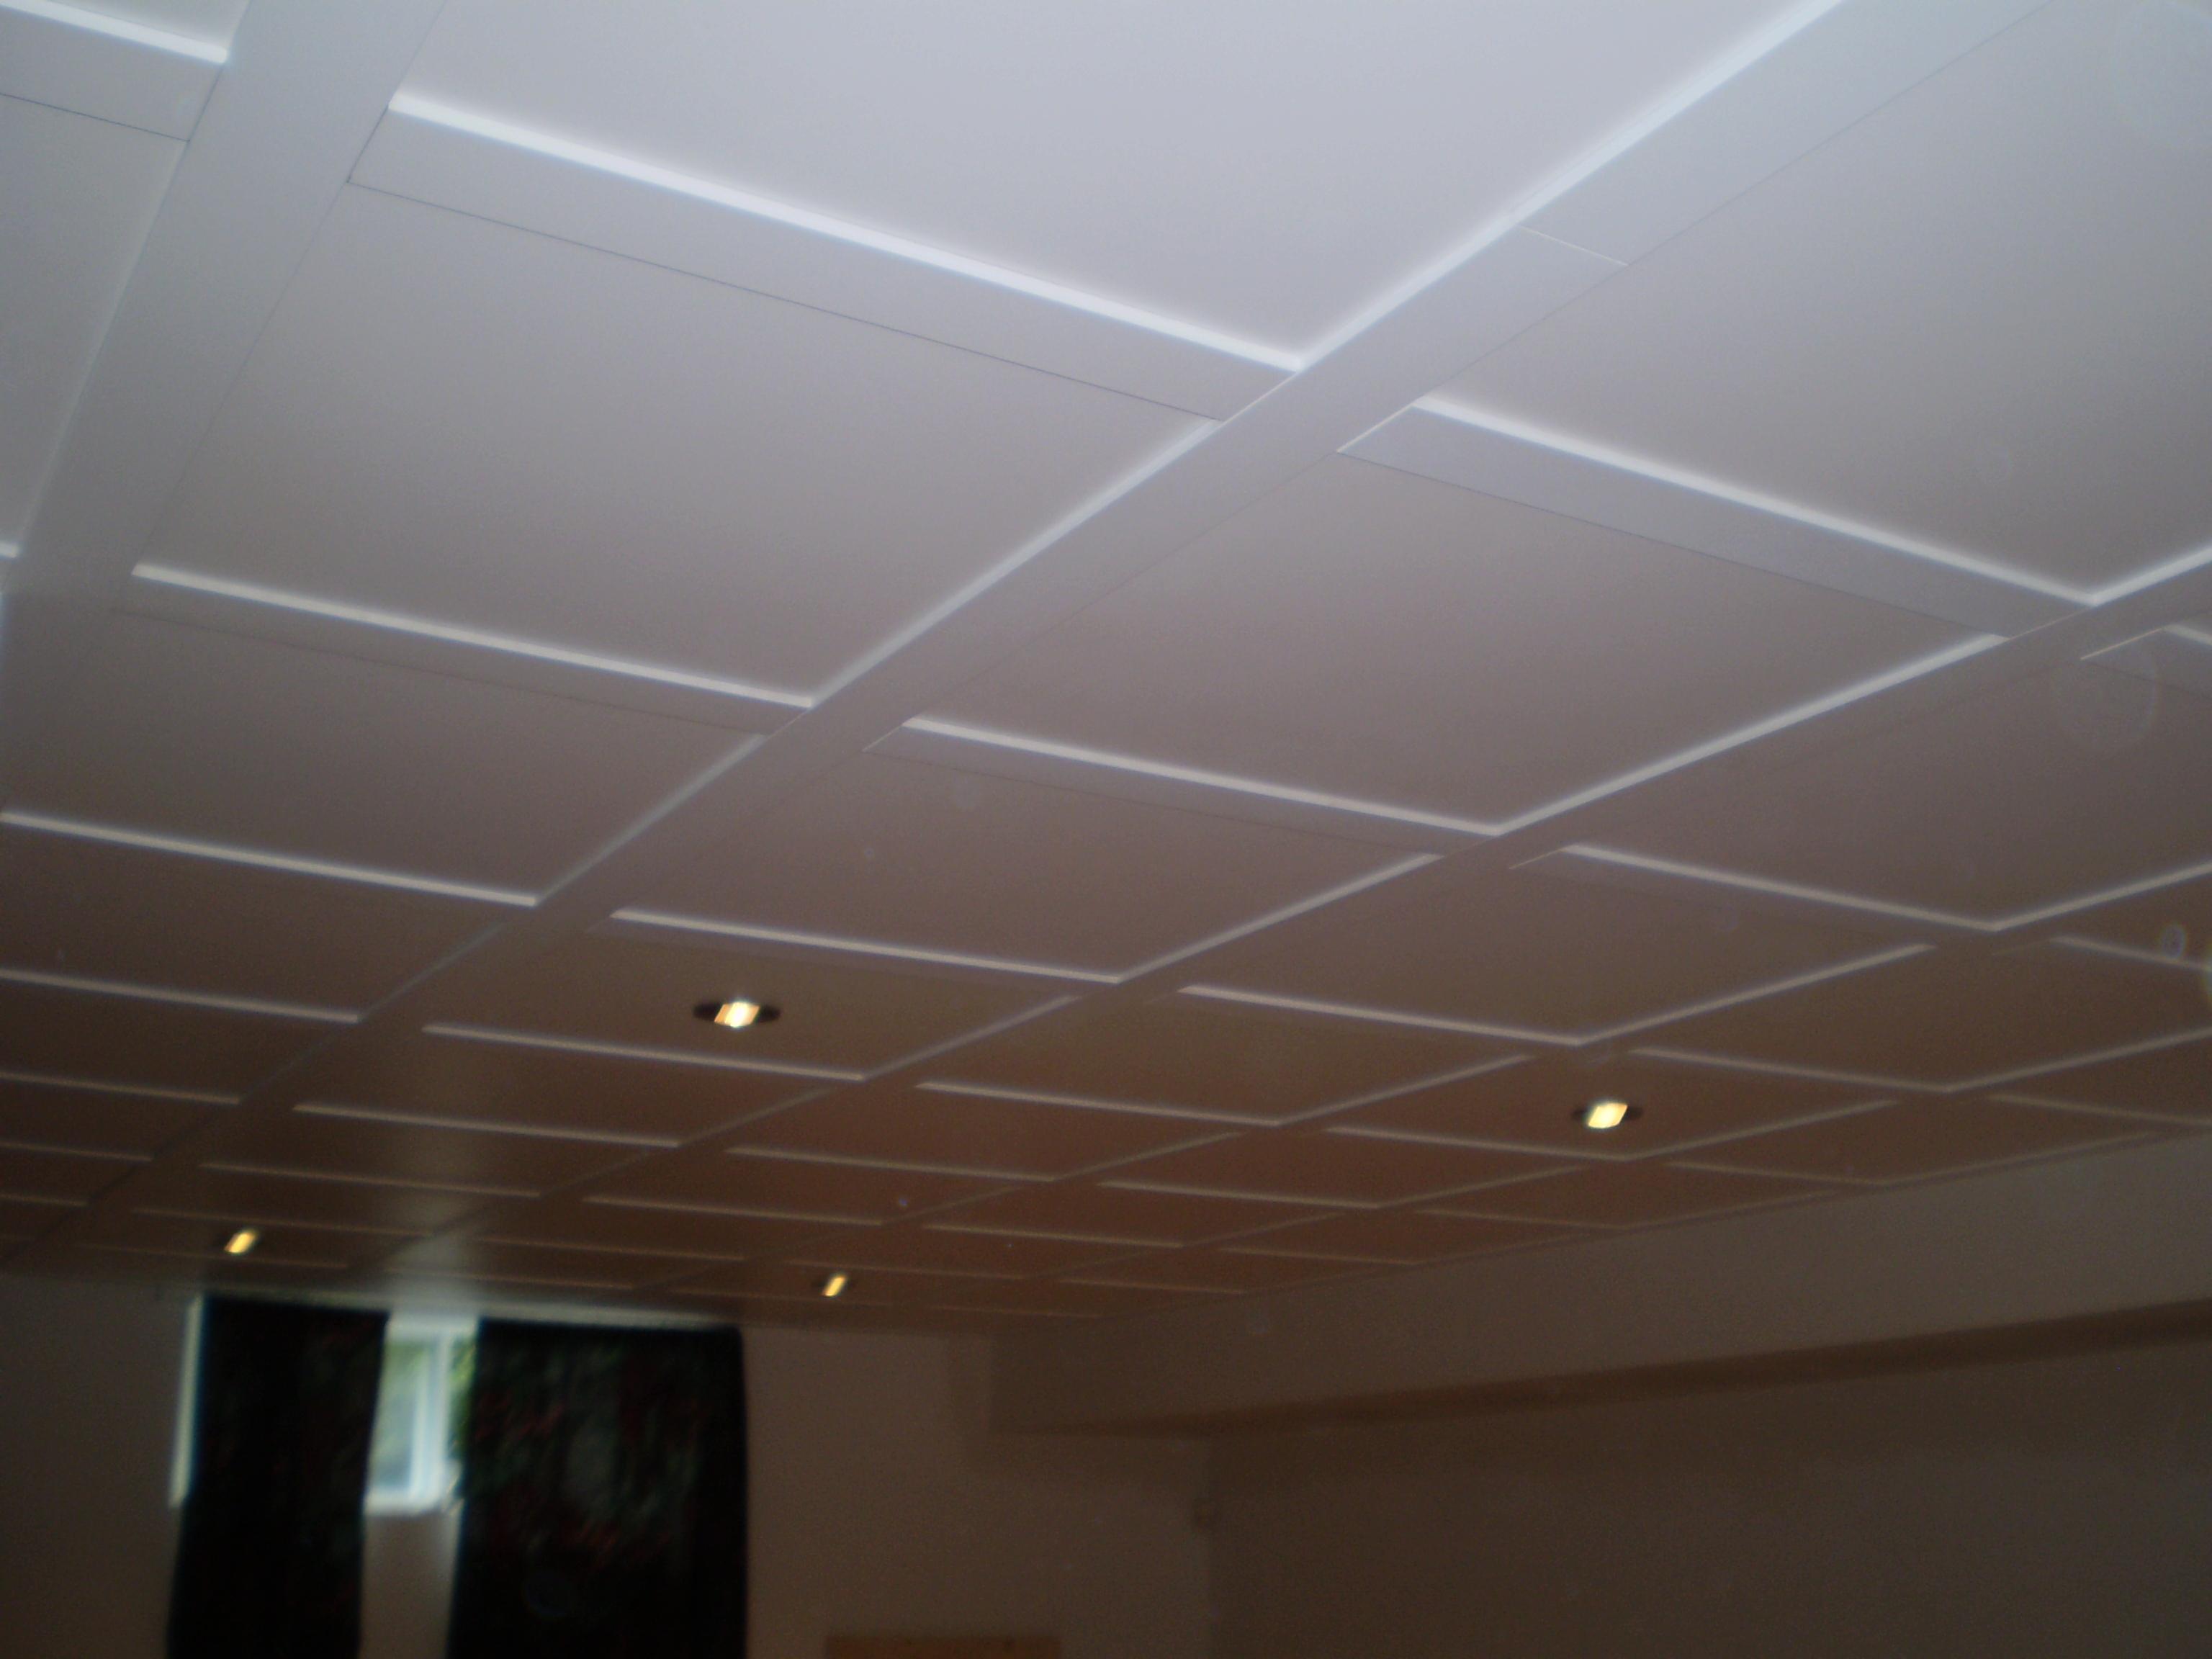 plafond suspendu en mdf isolation id es. Black Bedroom Furniture Sets. Home Design Ideas